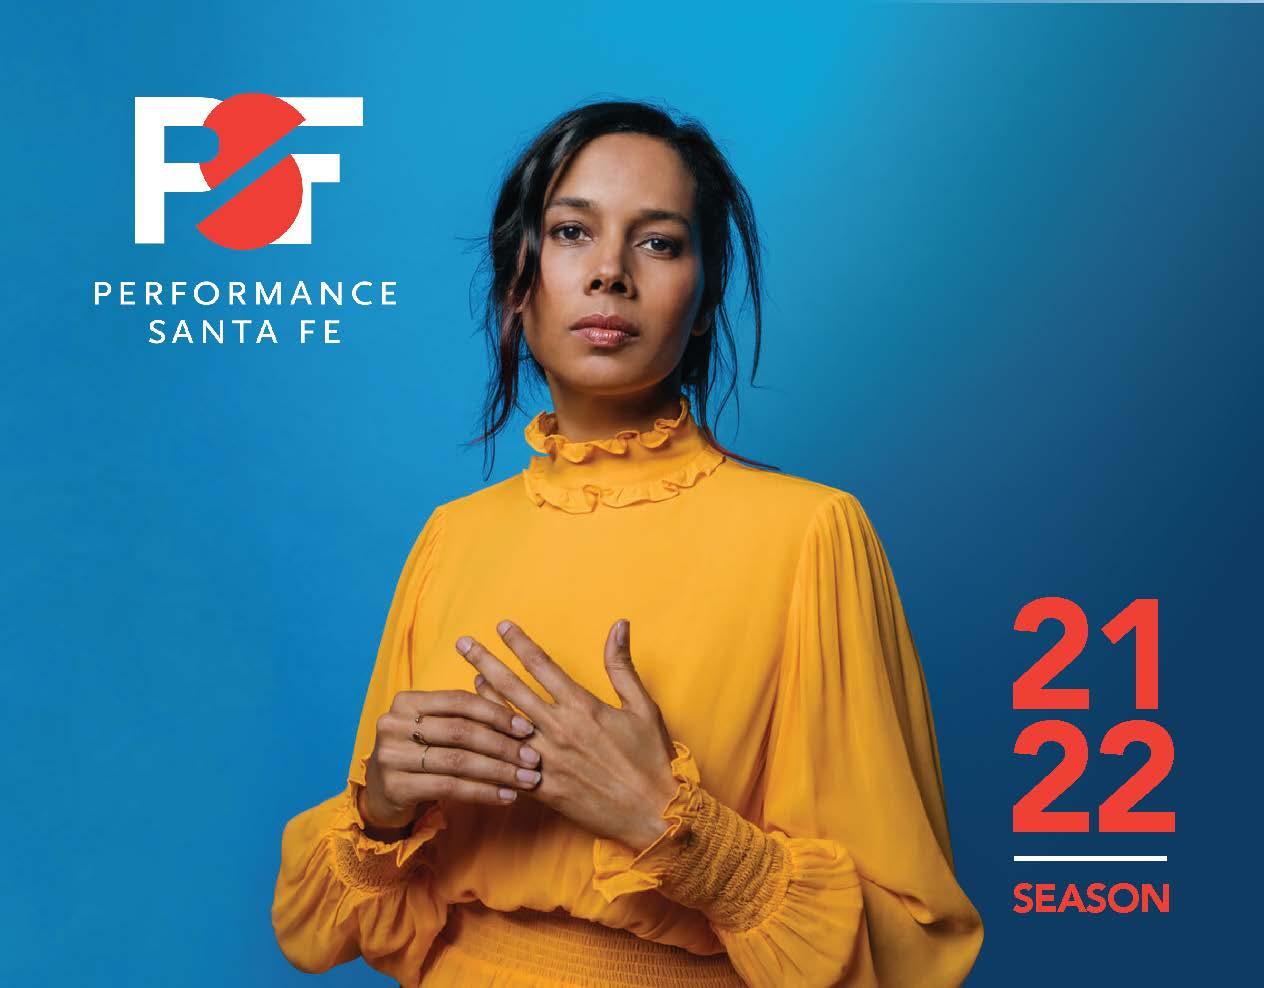 Performance Santa Fe 2021-2022 Brochure Cover